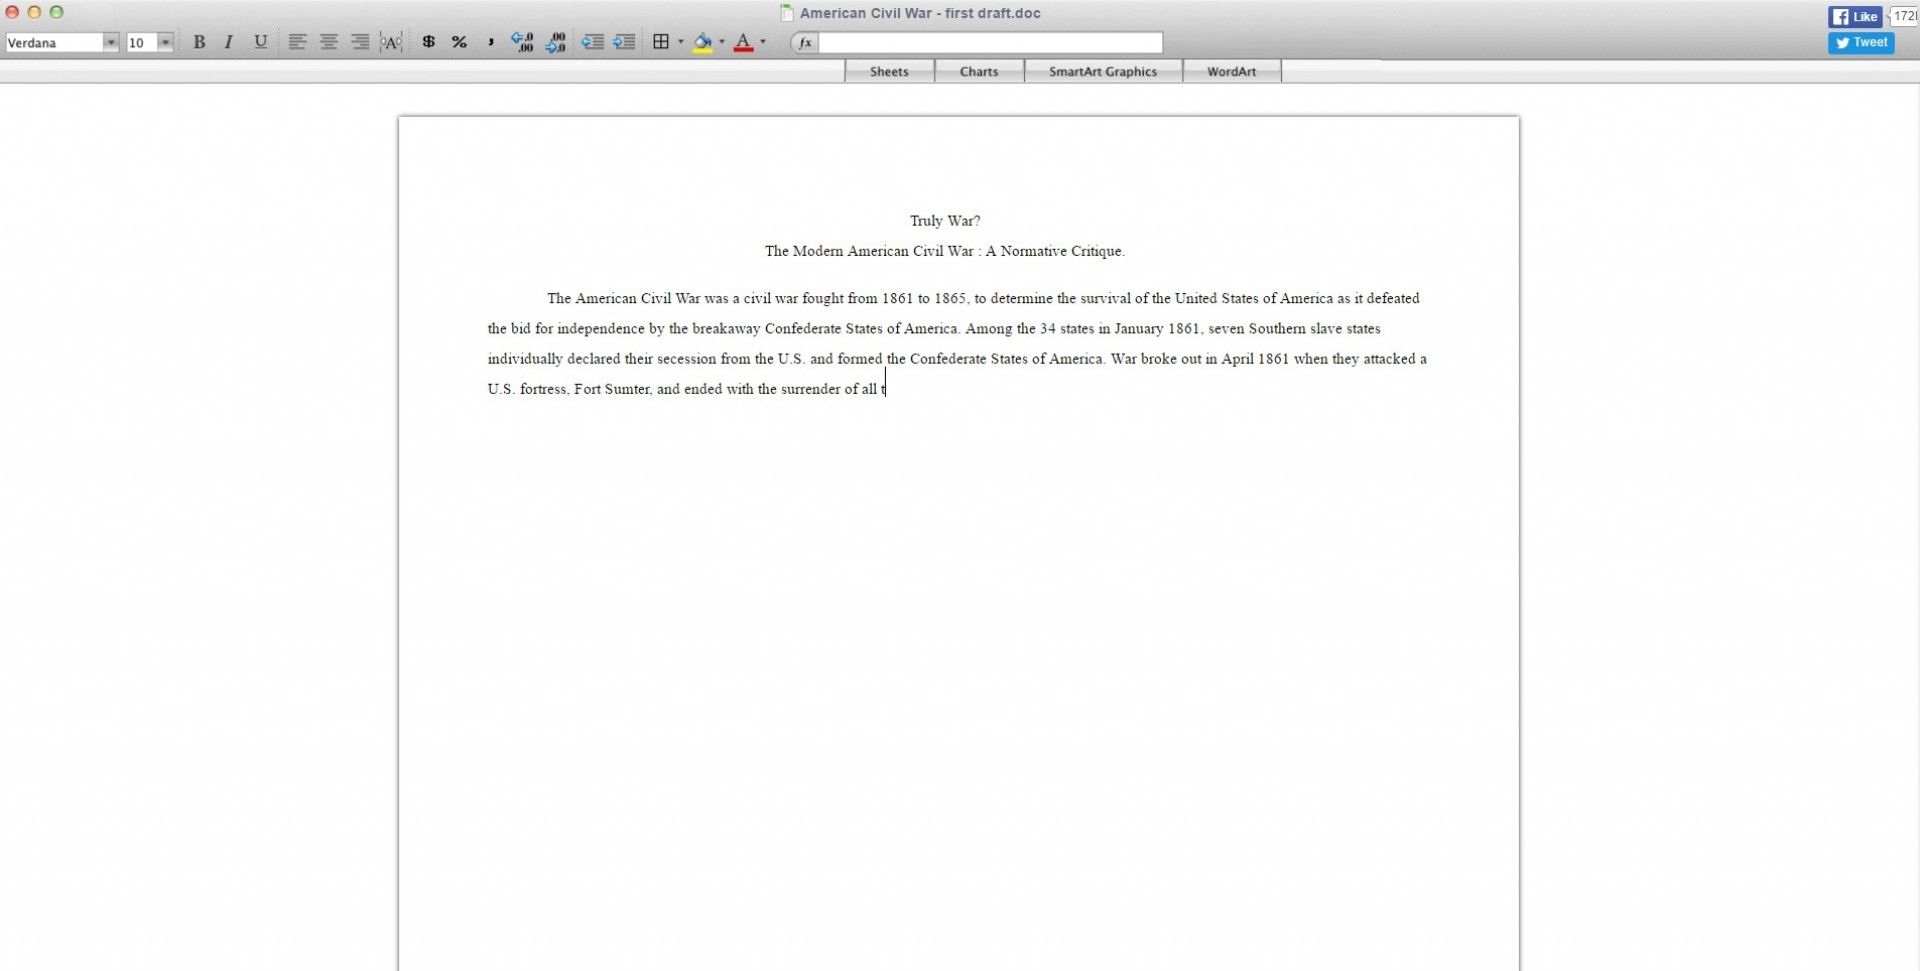 001 Essaytyper 106969 Fullformatjpgwidth1600height1600modeminupscalefalse Essay Typer Website Formidable 1920